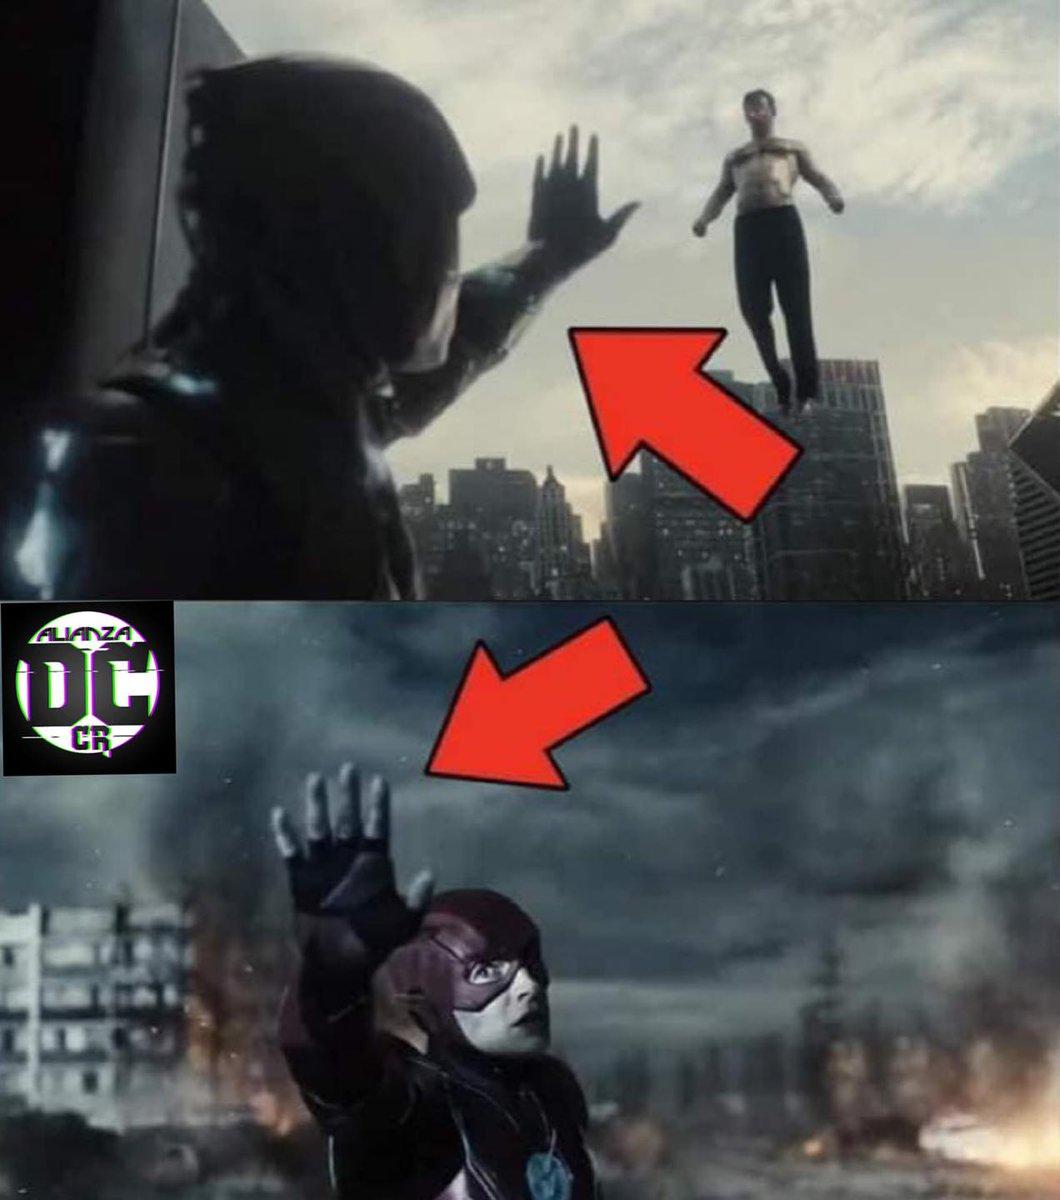 @QueHypeCR's photo on Superman